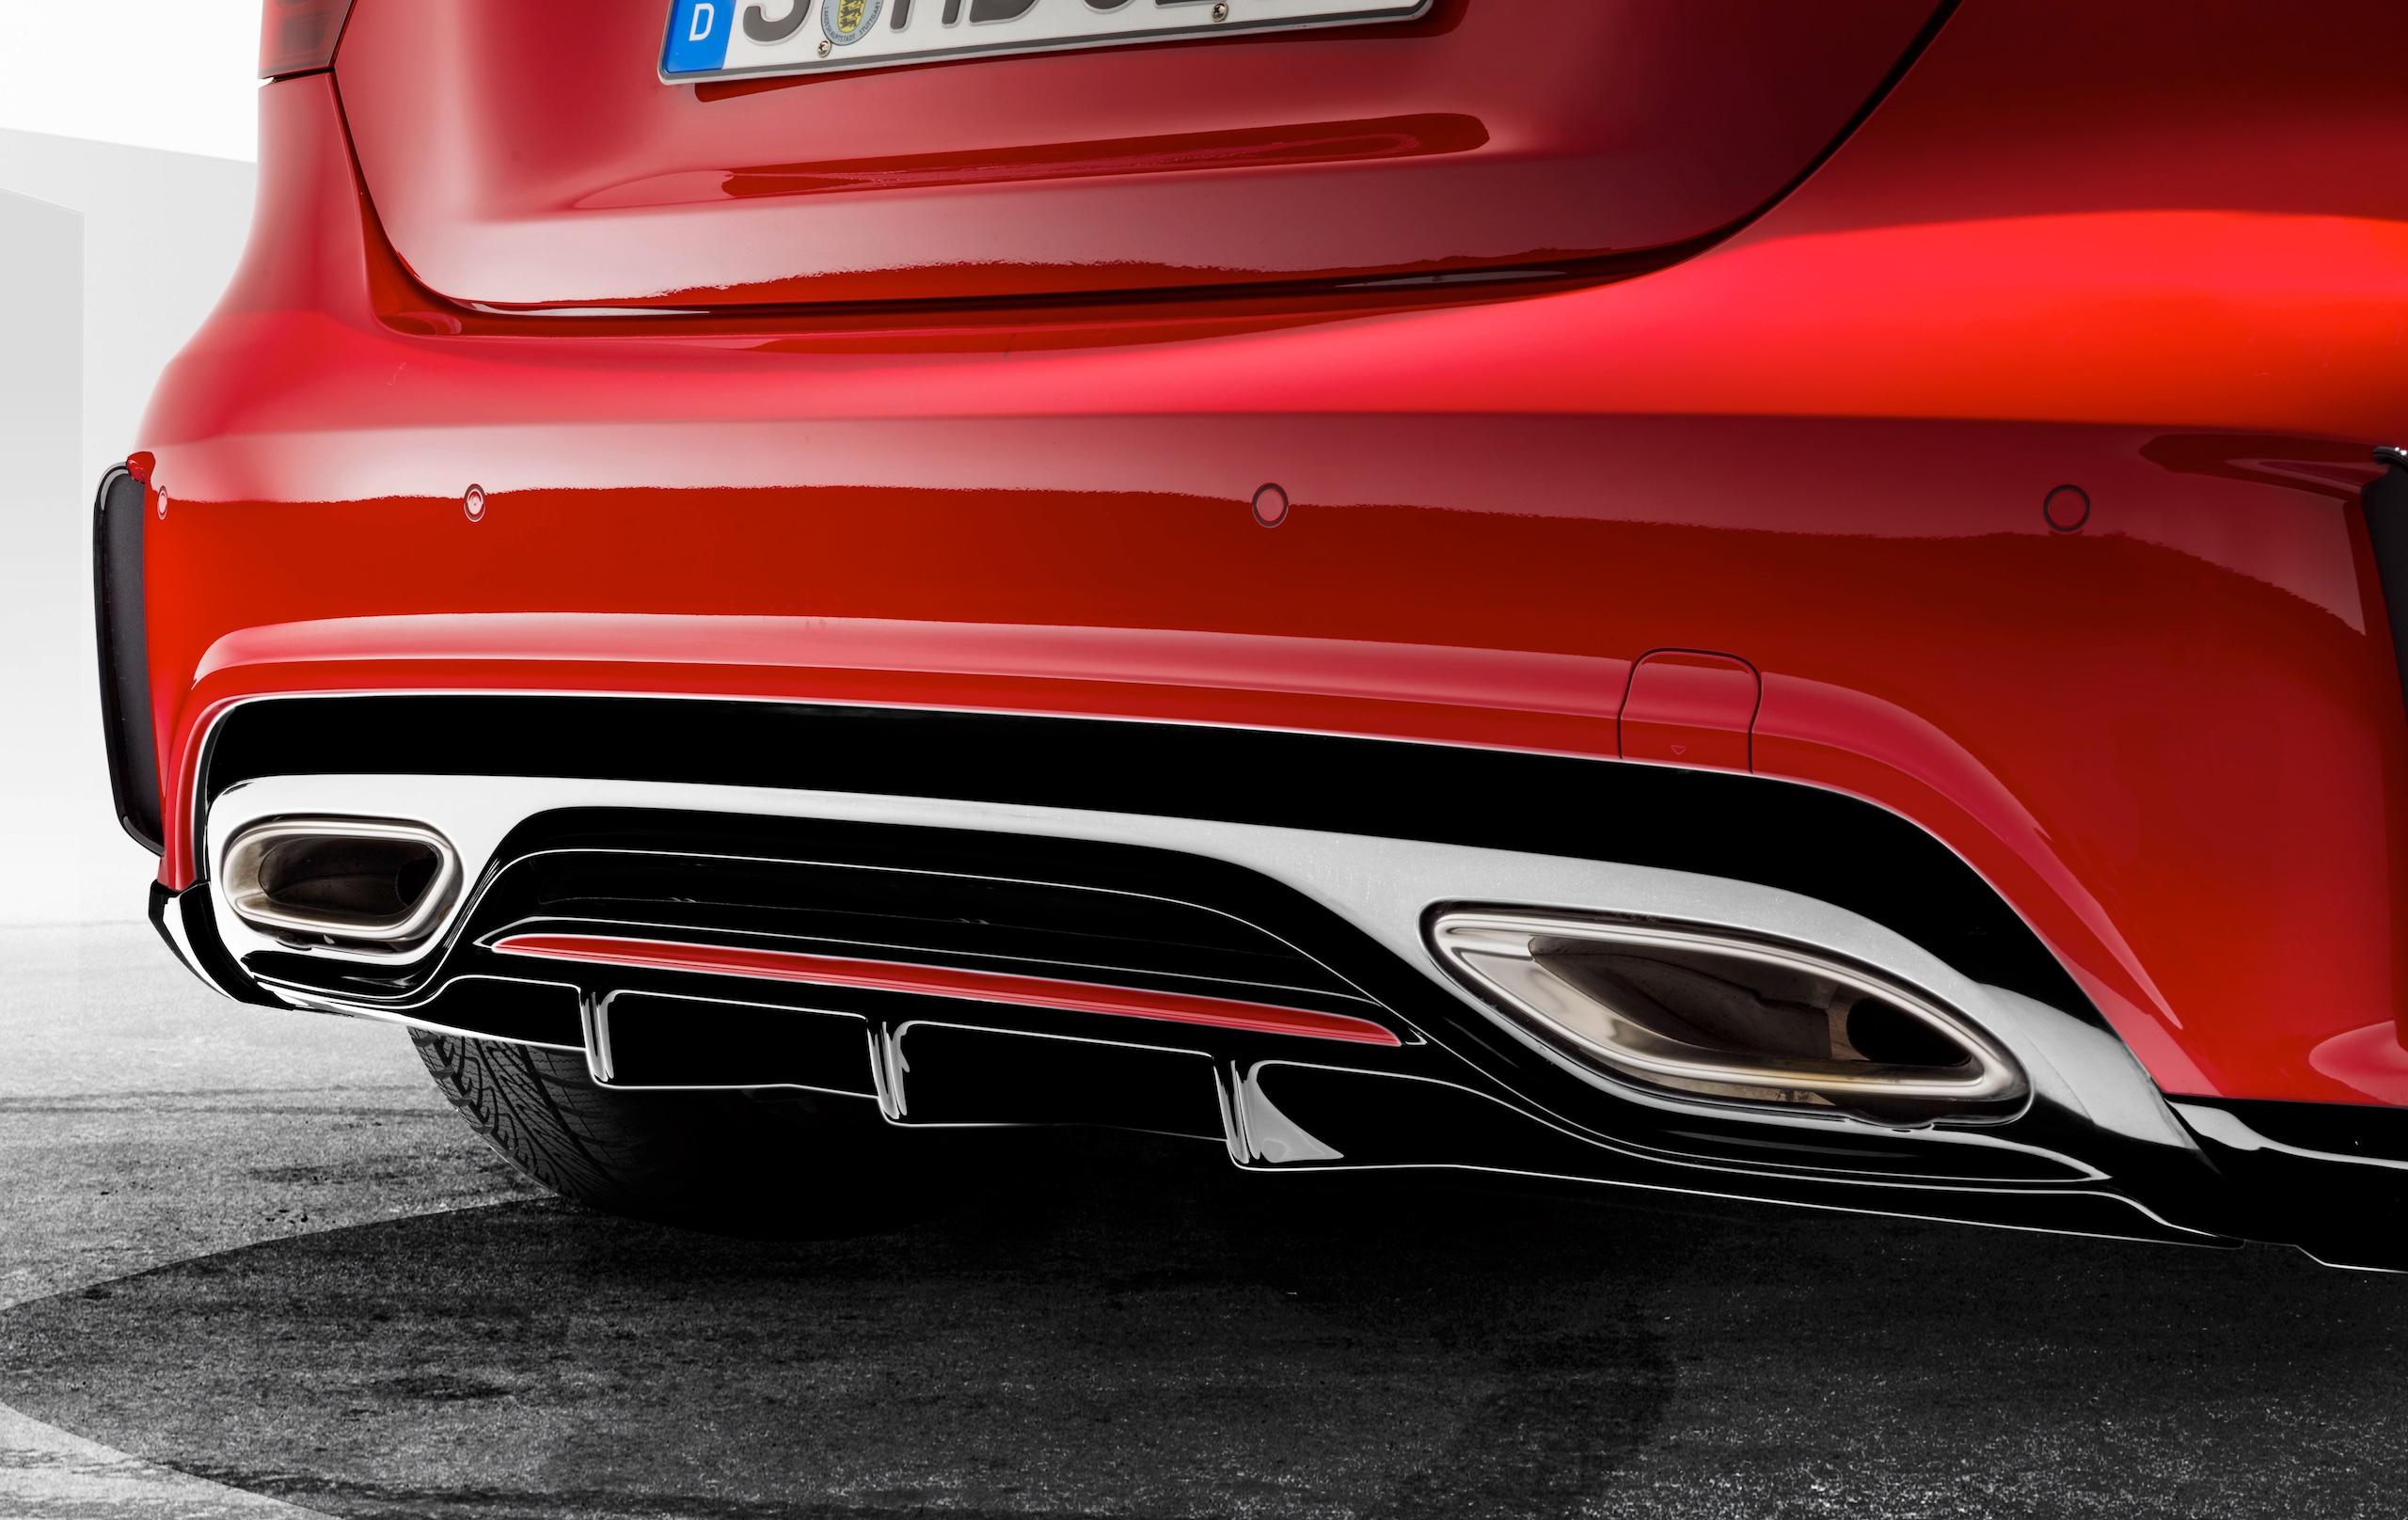 Mercedes Benz A Class Fl Gets New Amg Accessories Paul Tan